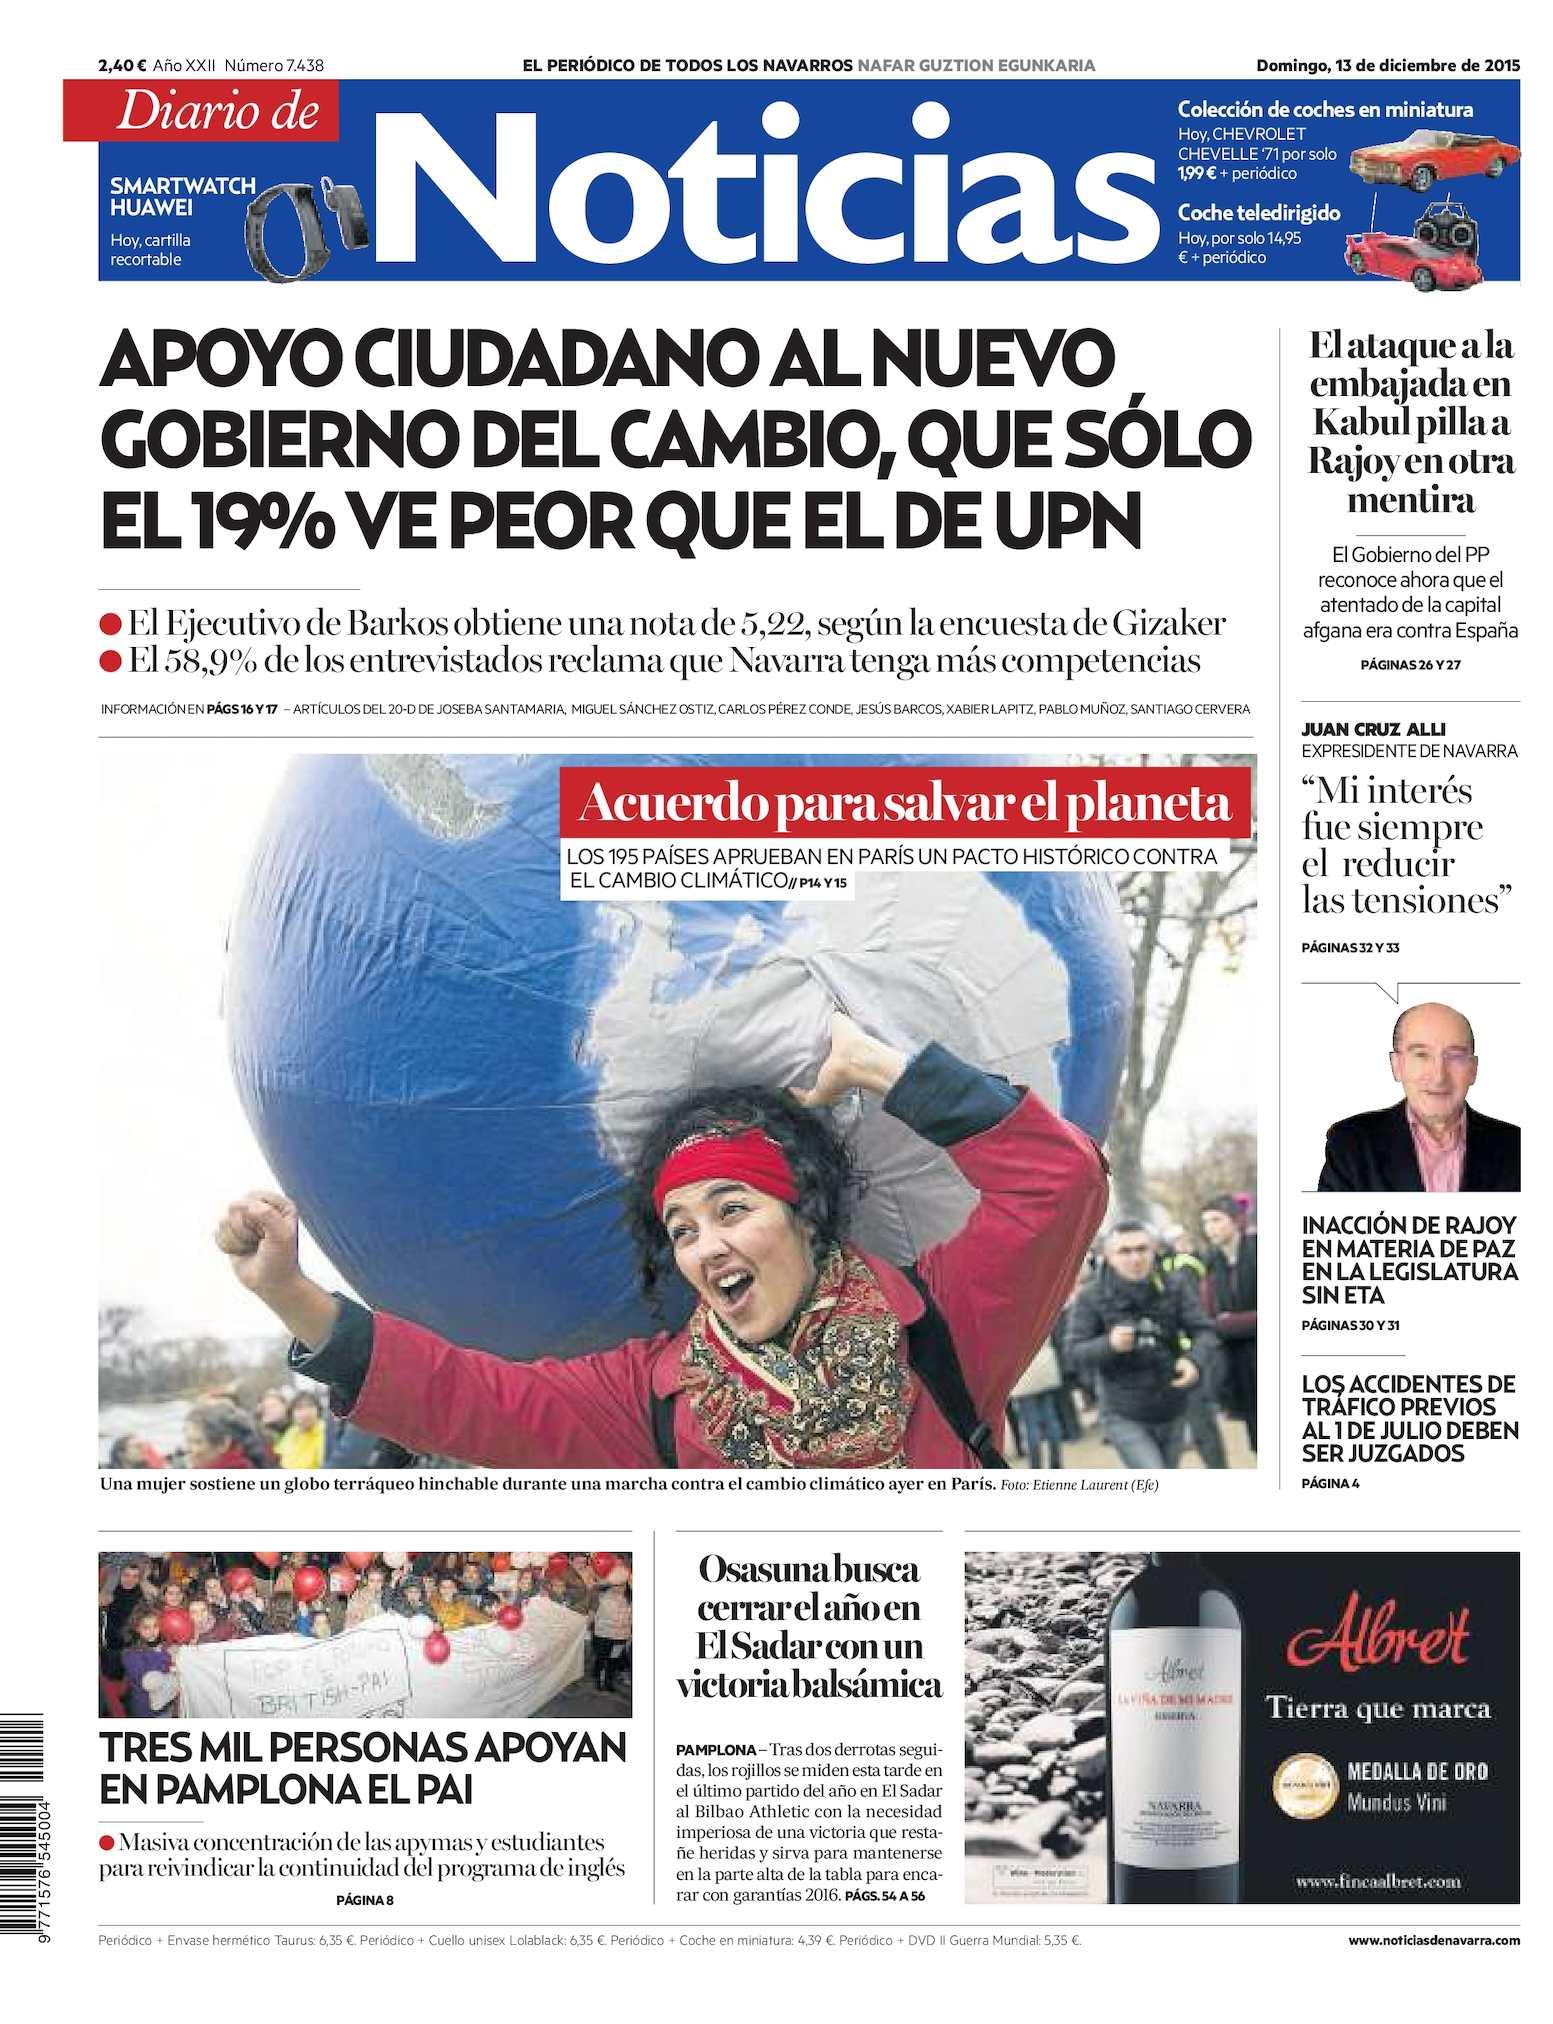 new style 6af4b d94ab Calaméo - Diario de Noticias 20151213